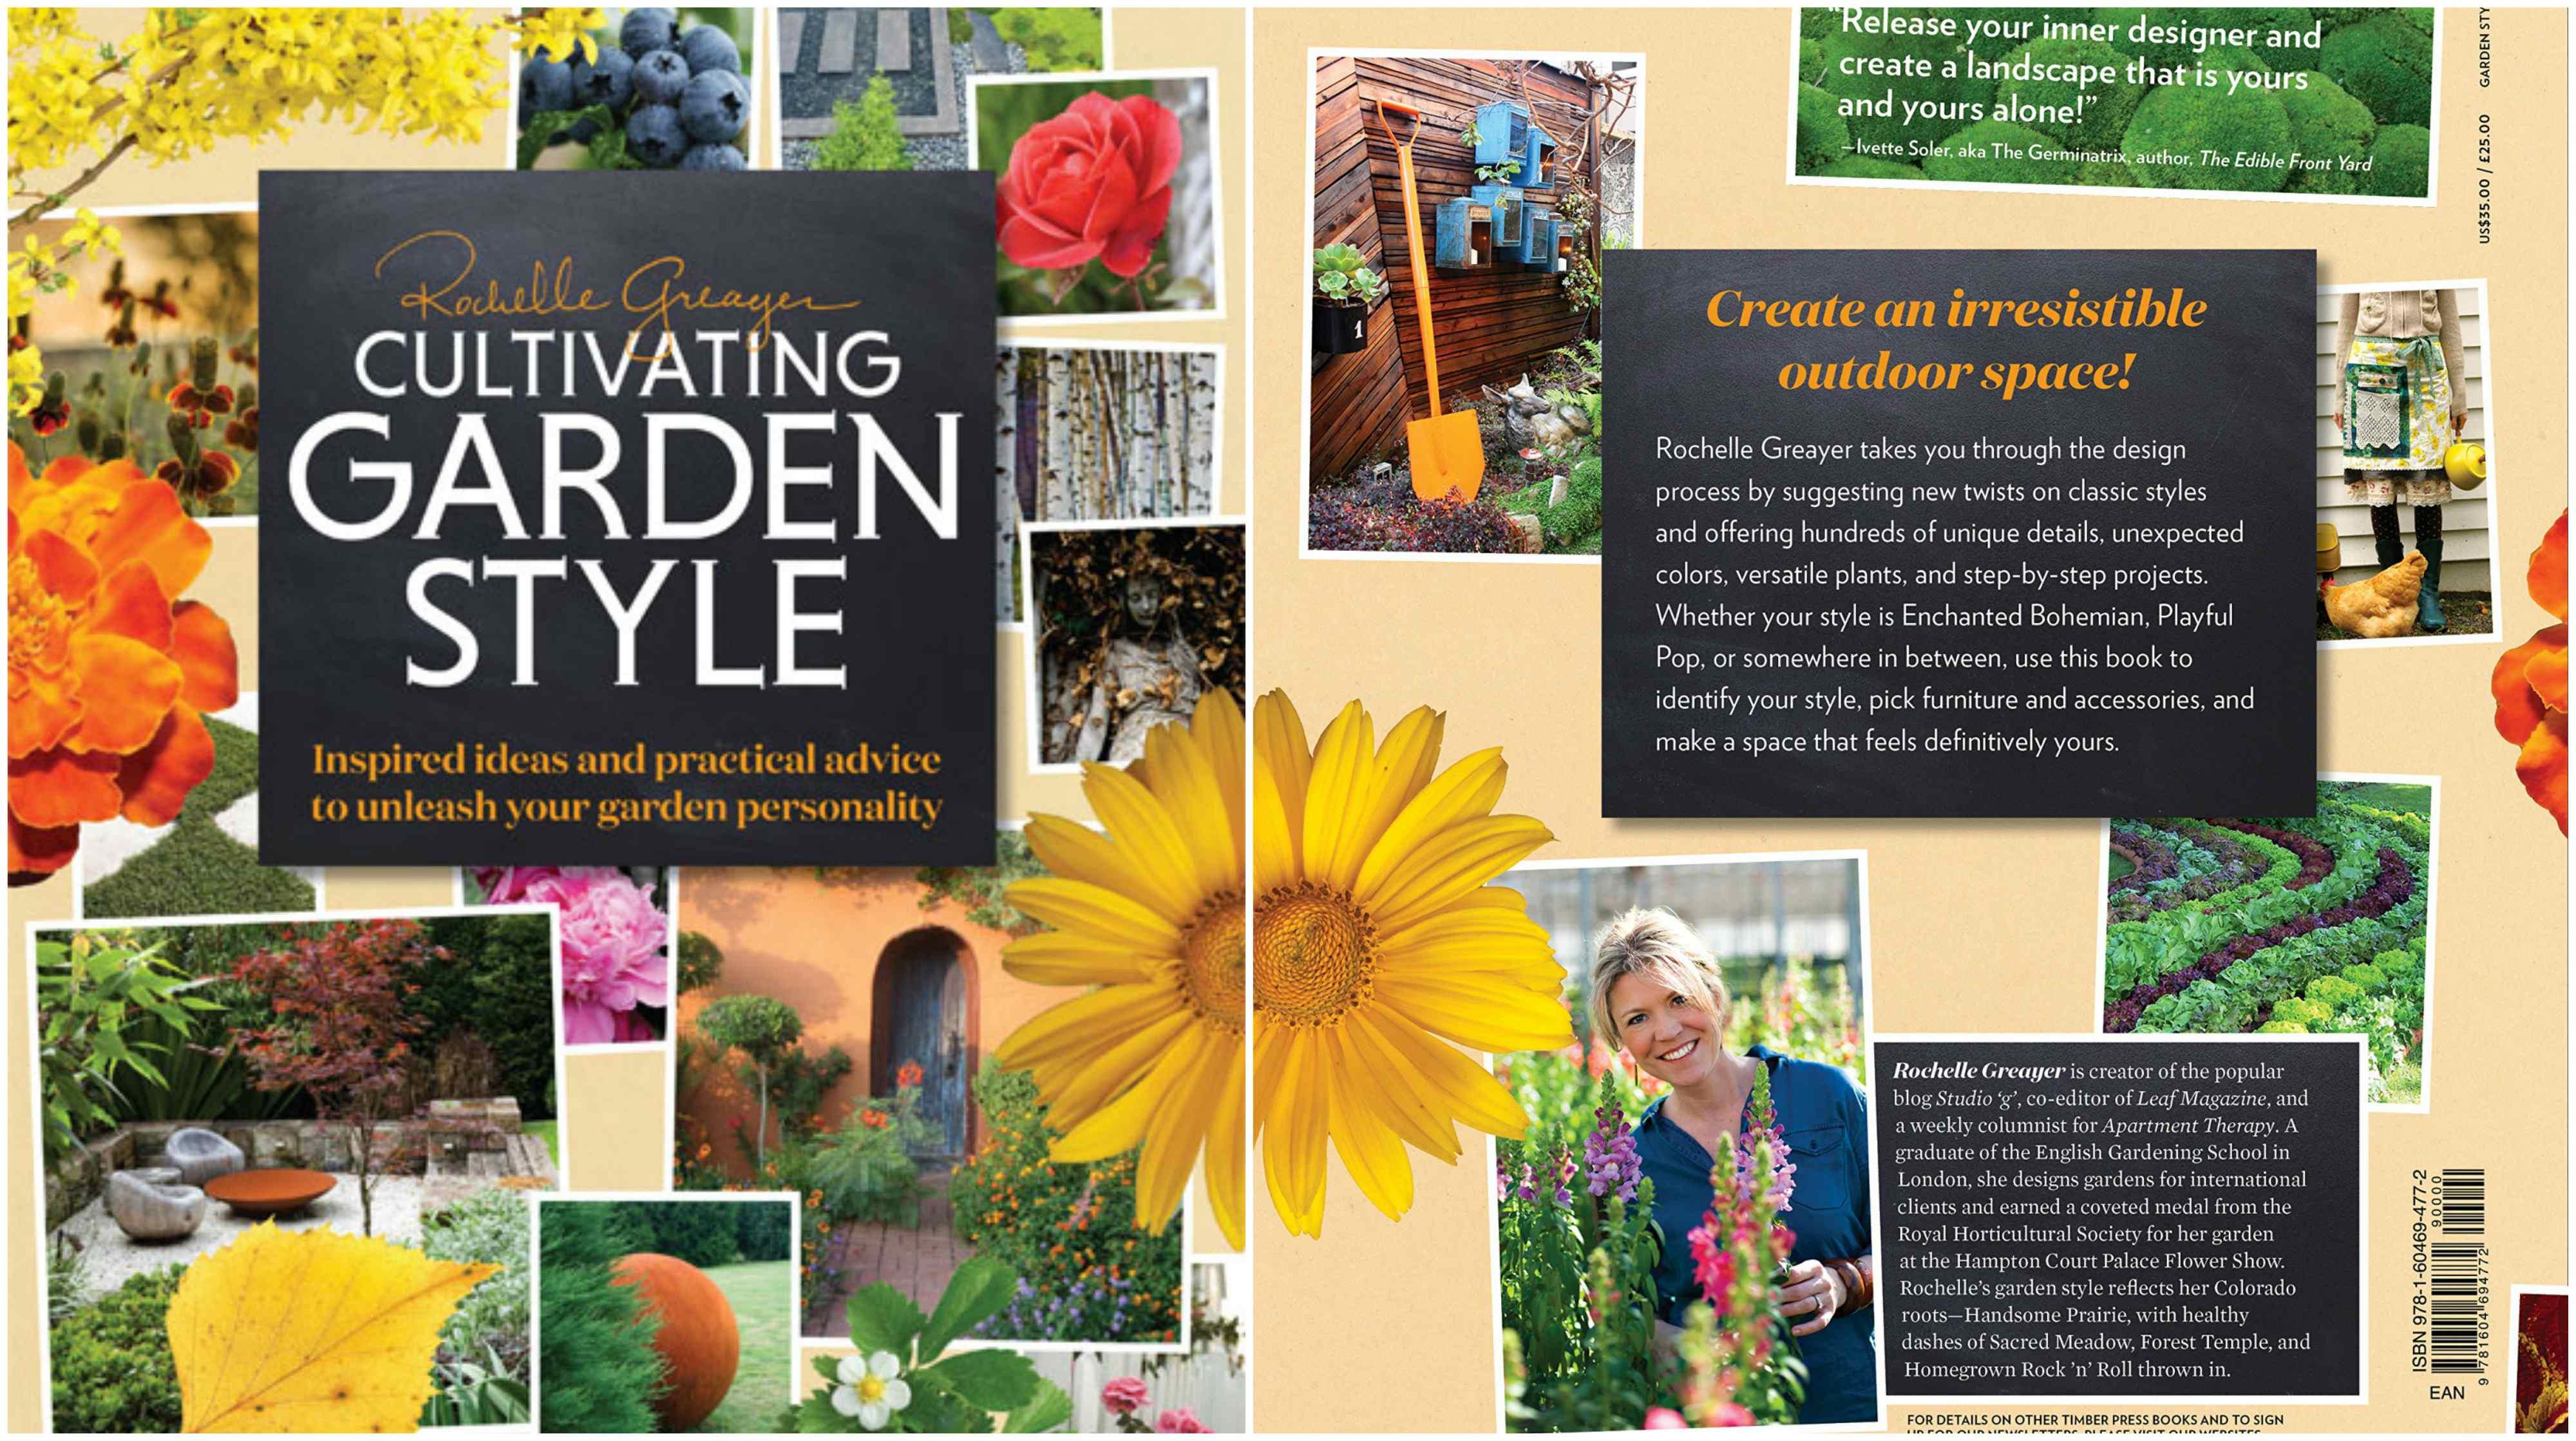 Most Popular Gardening Books 2017 Top 10 List